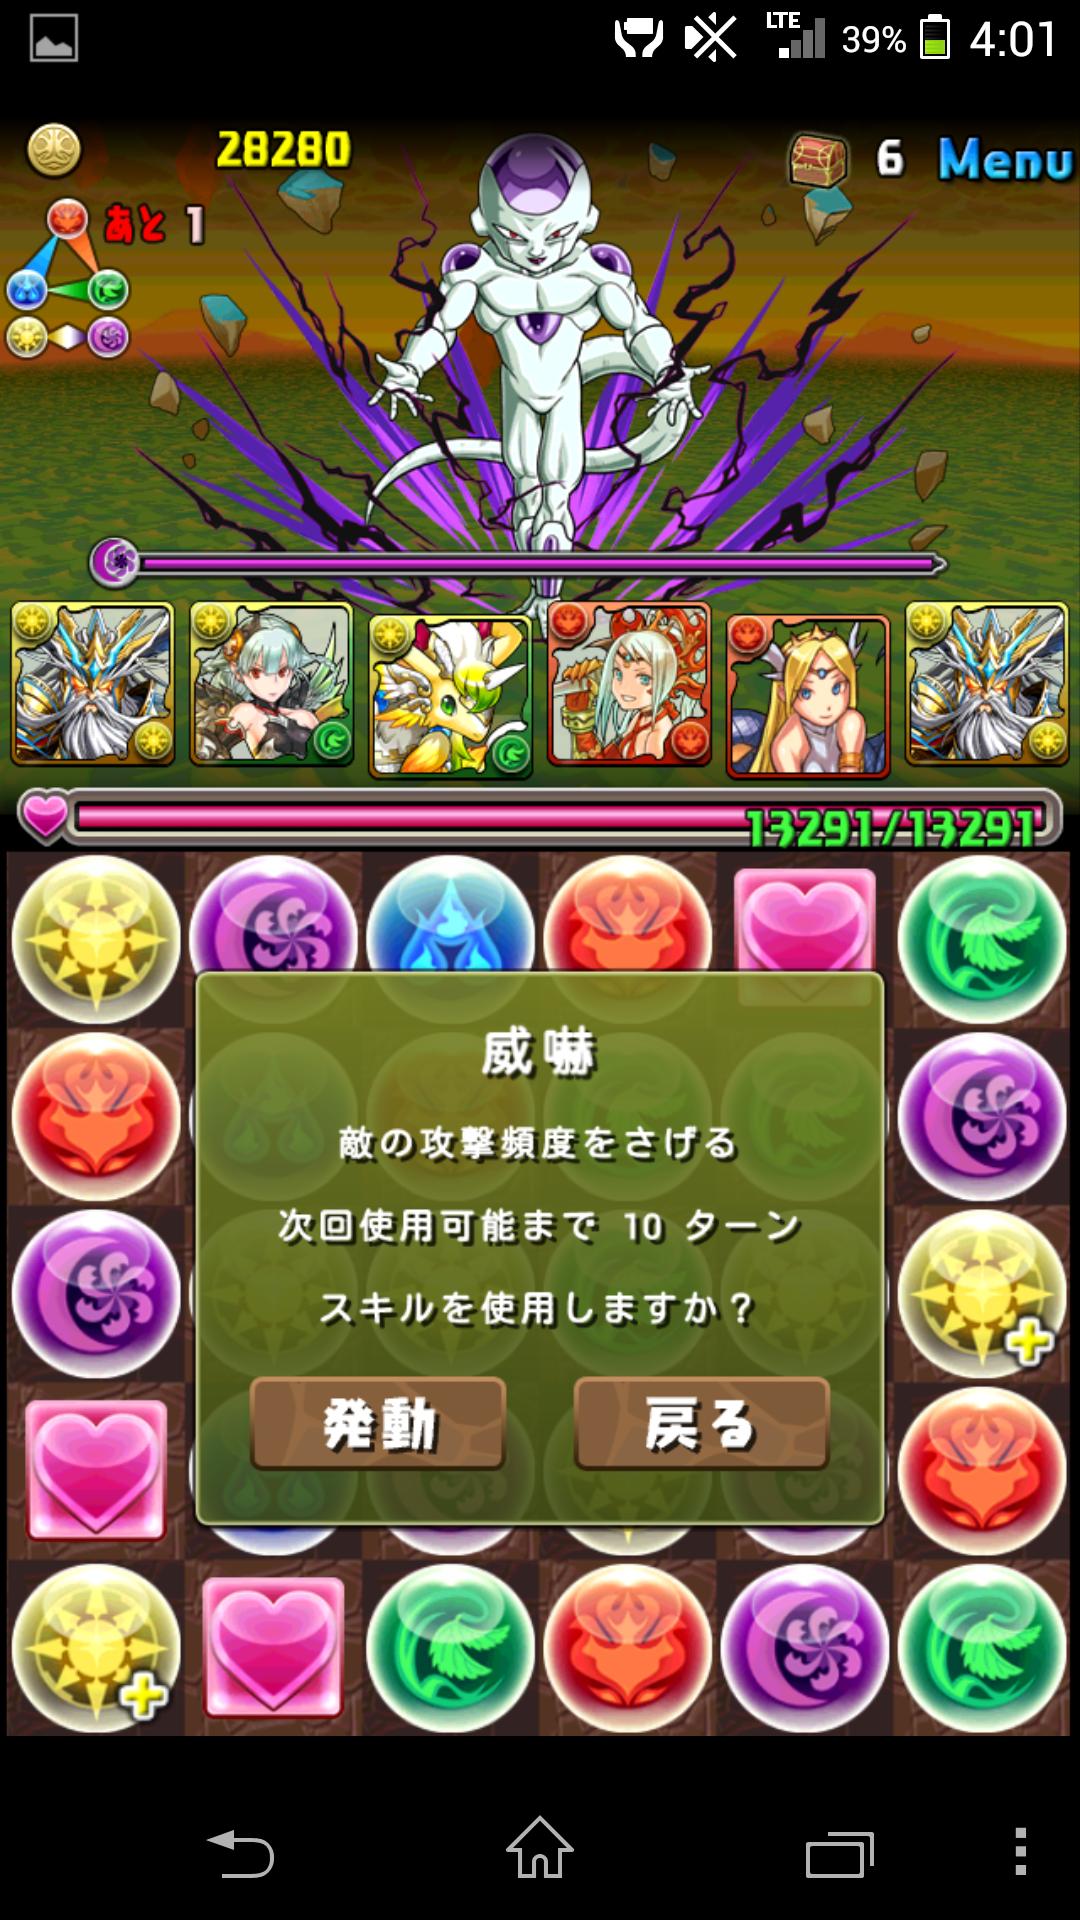 Screenshot_2014-06-06-04-01-04.png